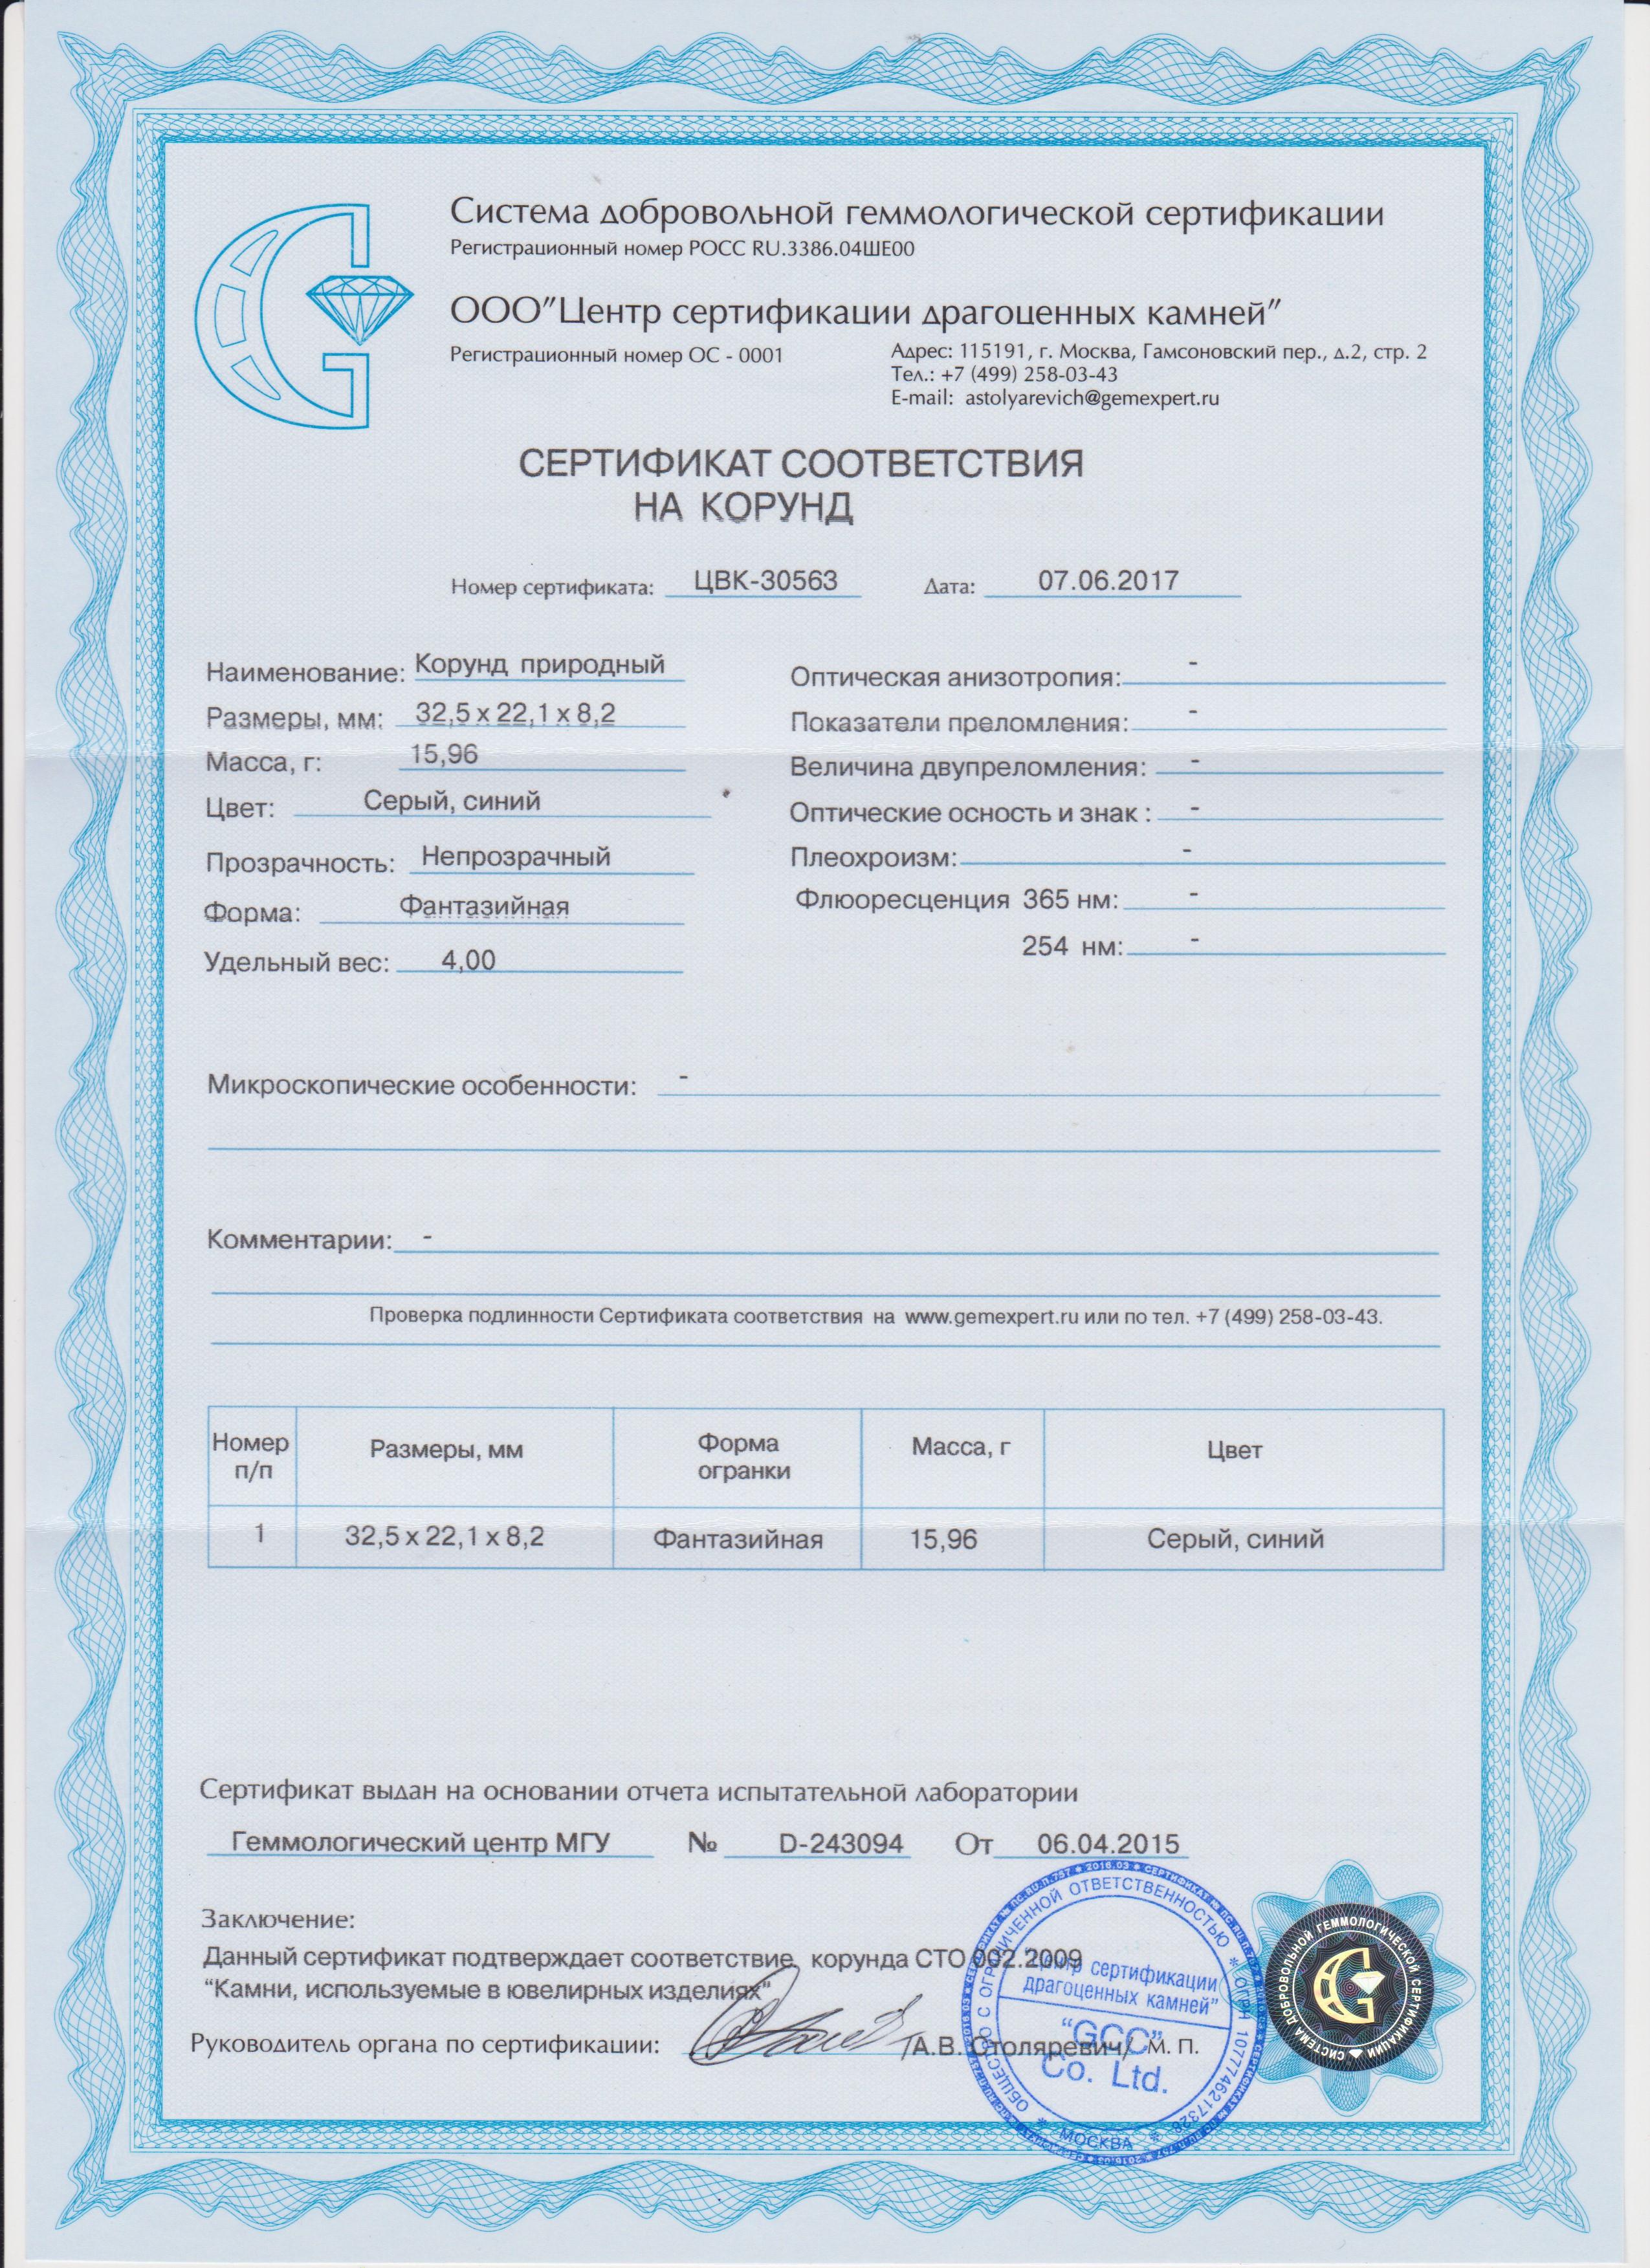 https://mineralmarket.ru/img/certificate/337/1497884573.jpg